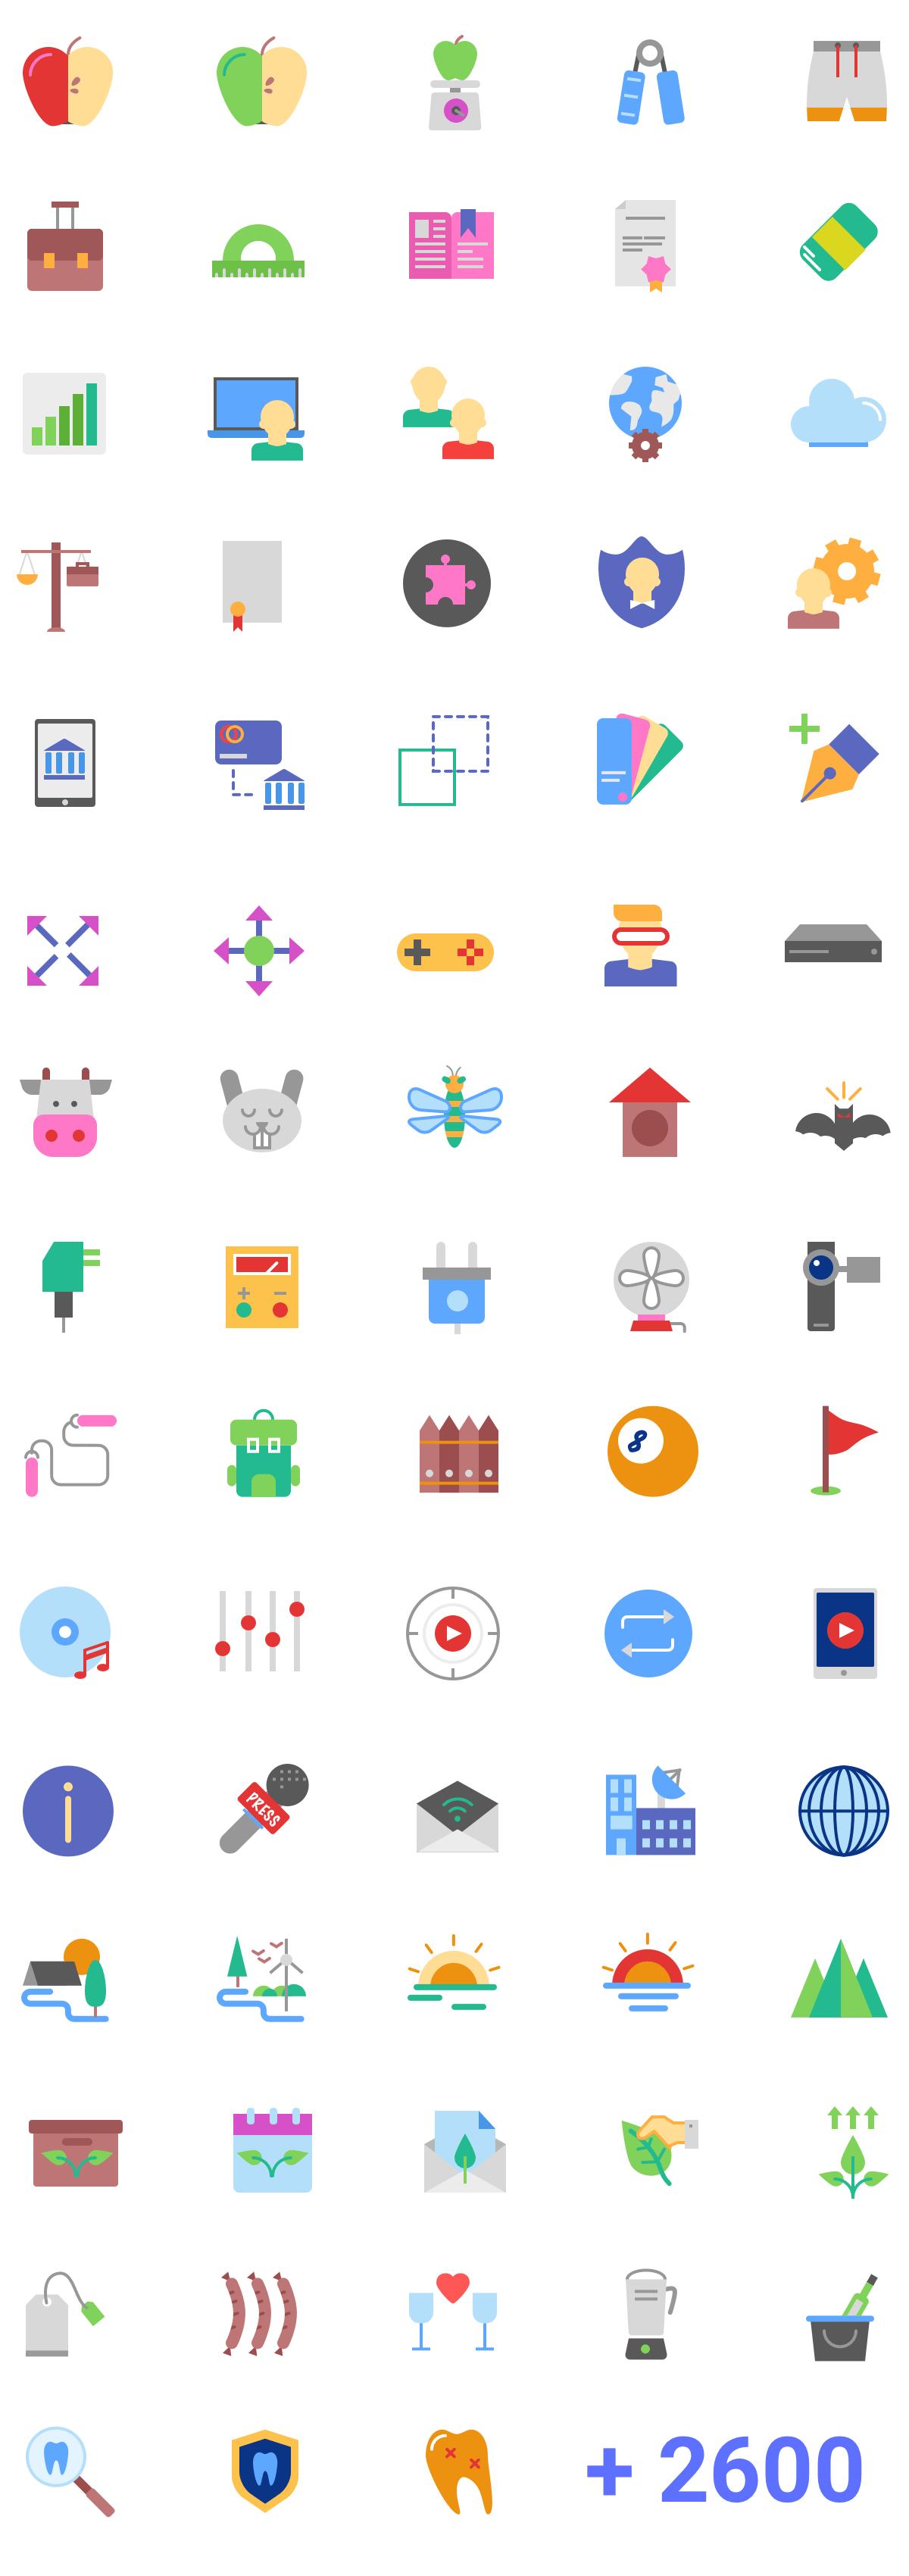 Magicons - Free 2687 Flat Icons